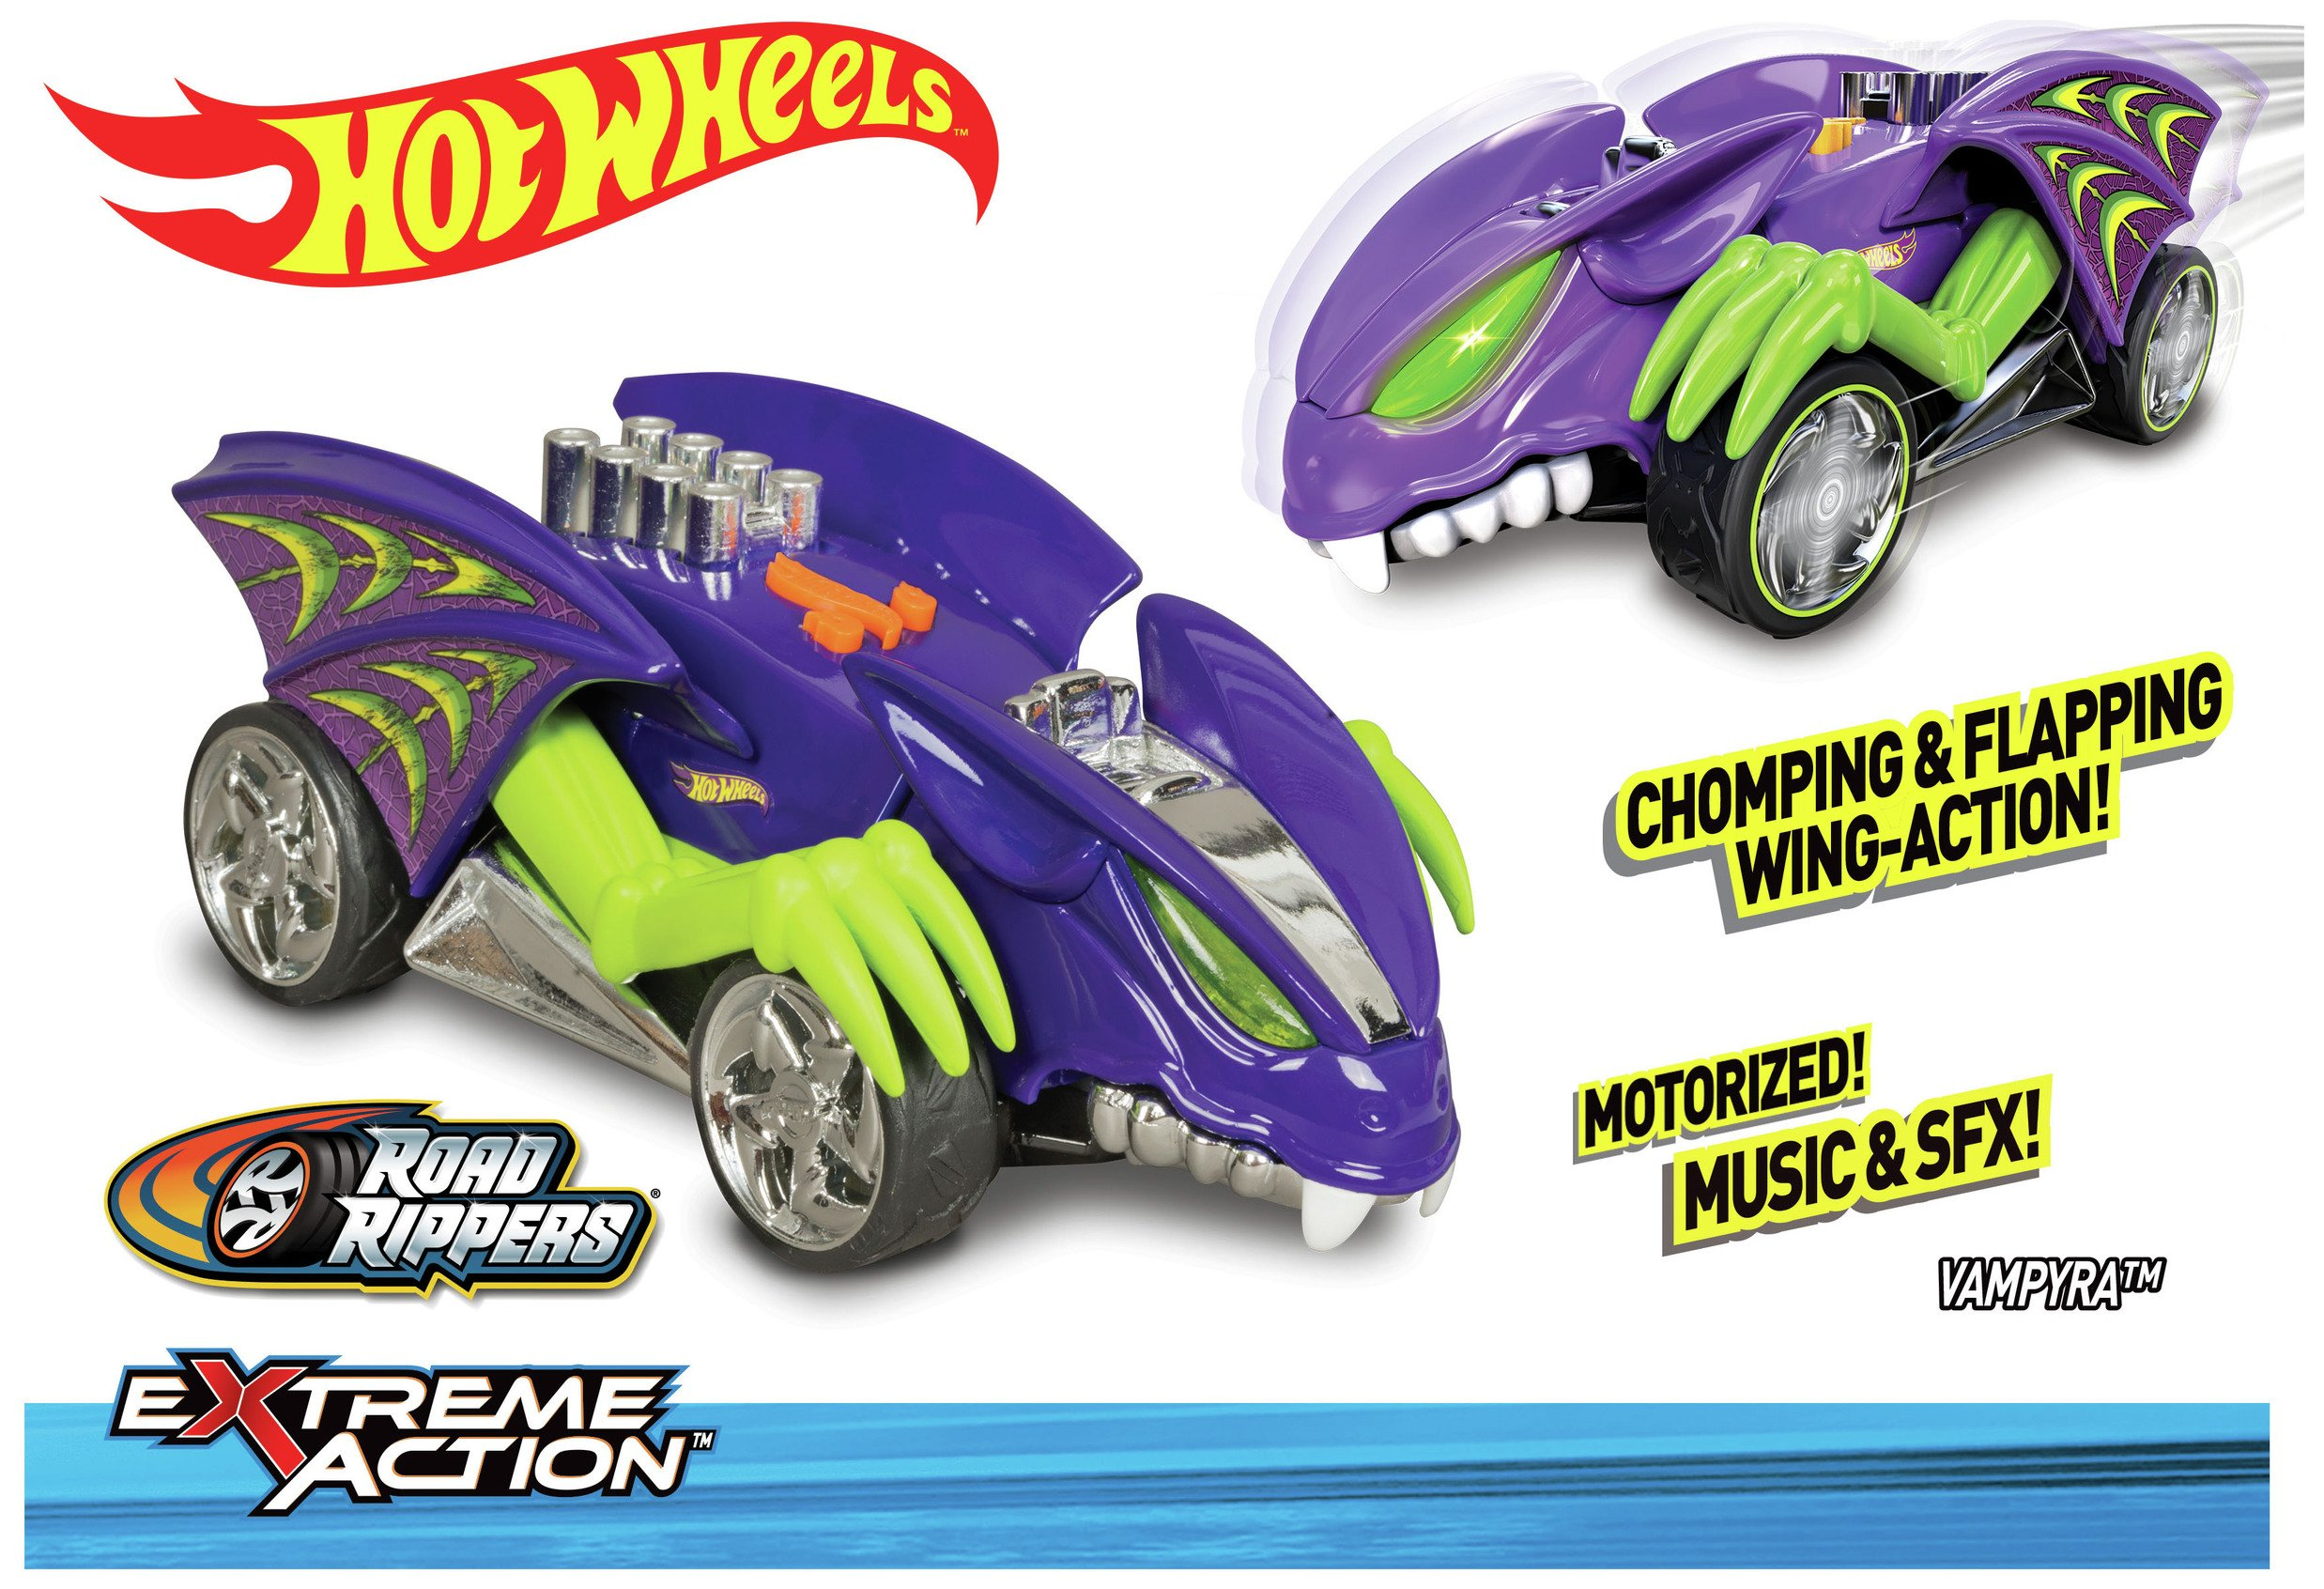 Hot Wheels Exteme Action Vampyra Car.